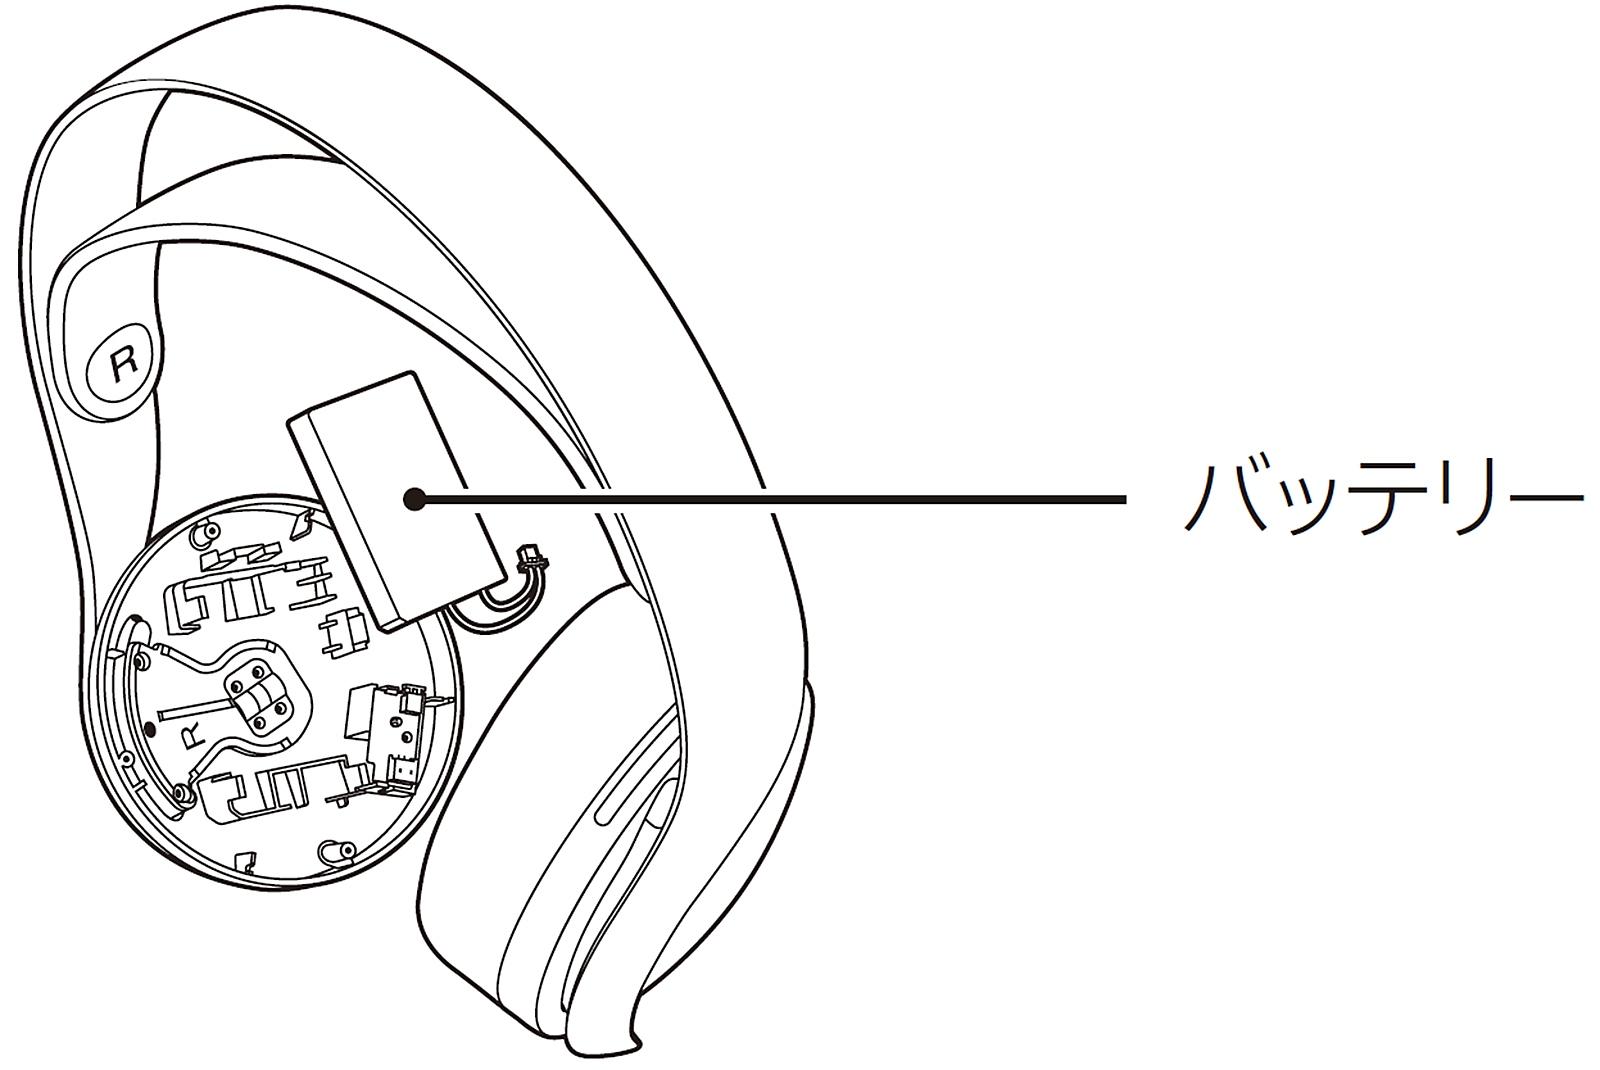 CFI-ZWH1J-image-block-remove-battery-06-ja-jp-28apr21.png